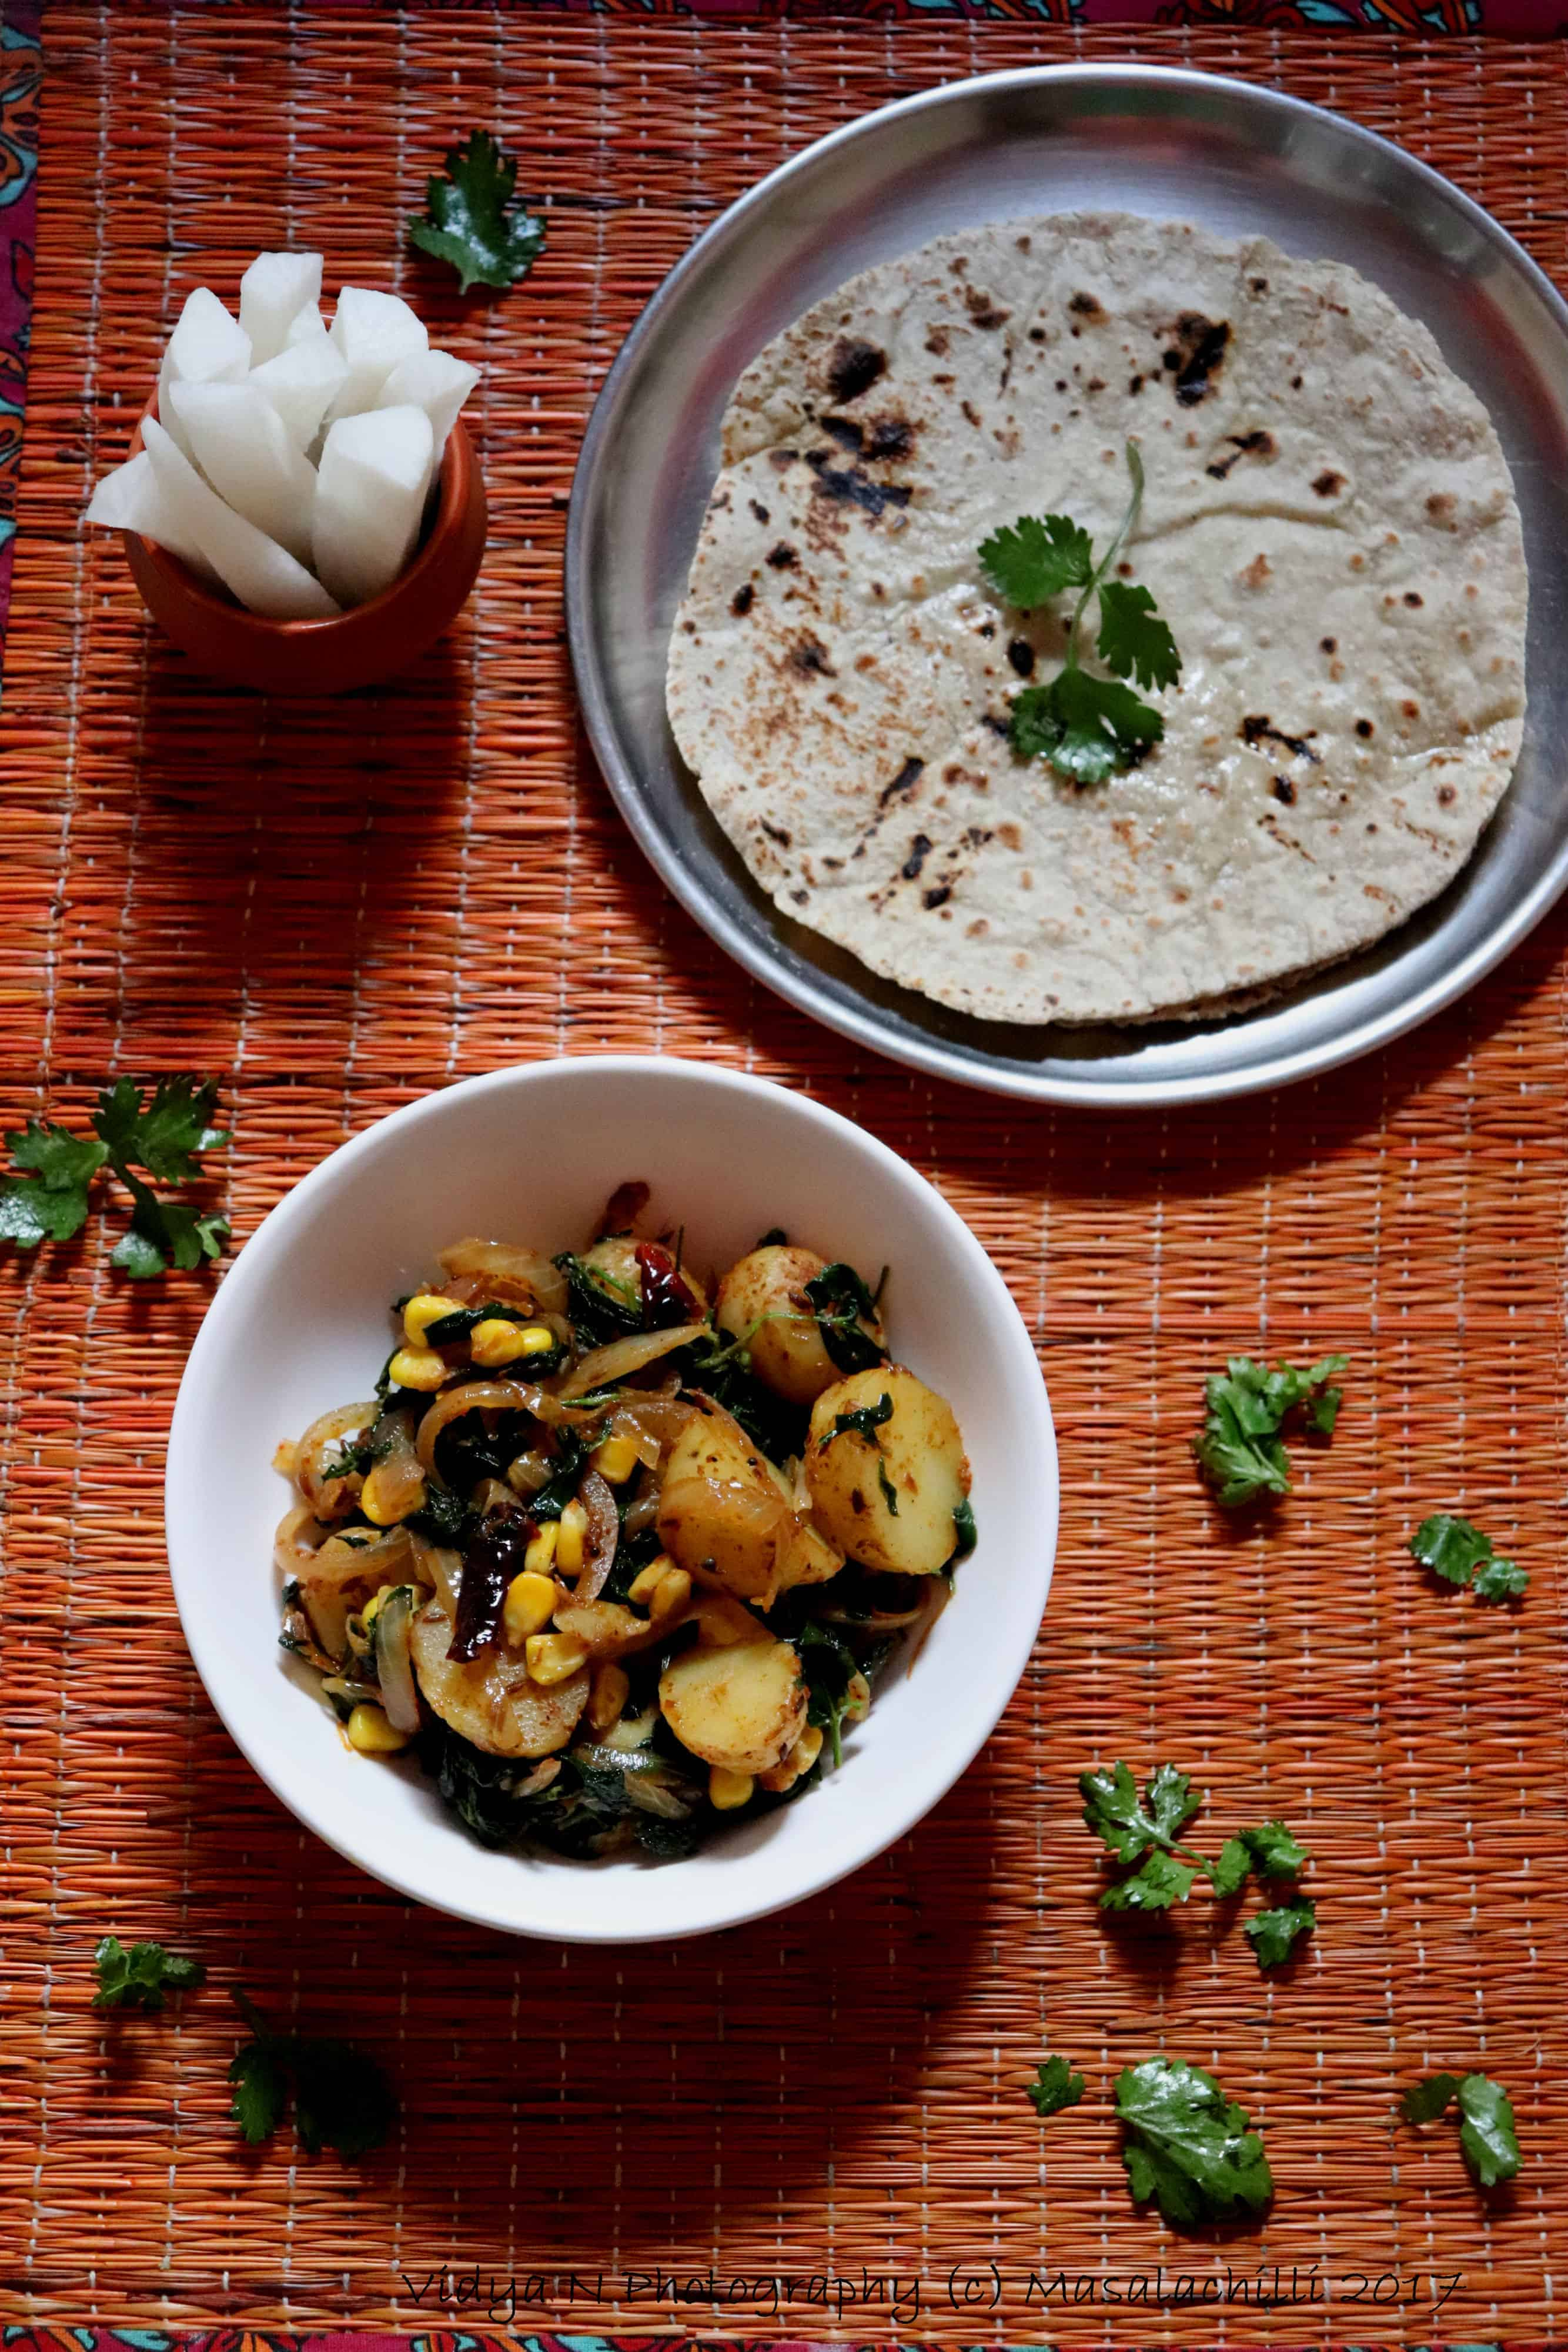 Winter Special Platter – Aloo Corn Methi with Whole Wheat Bajra Rotis and Raddish